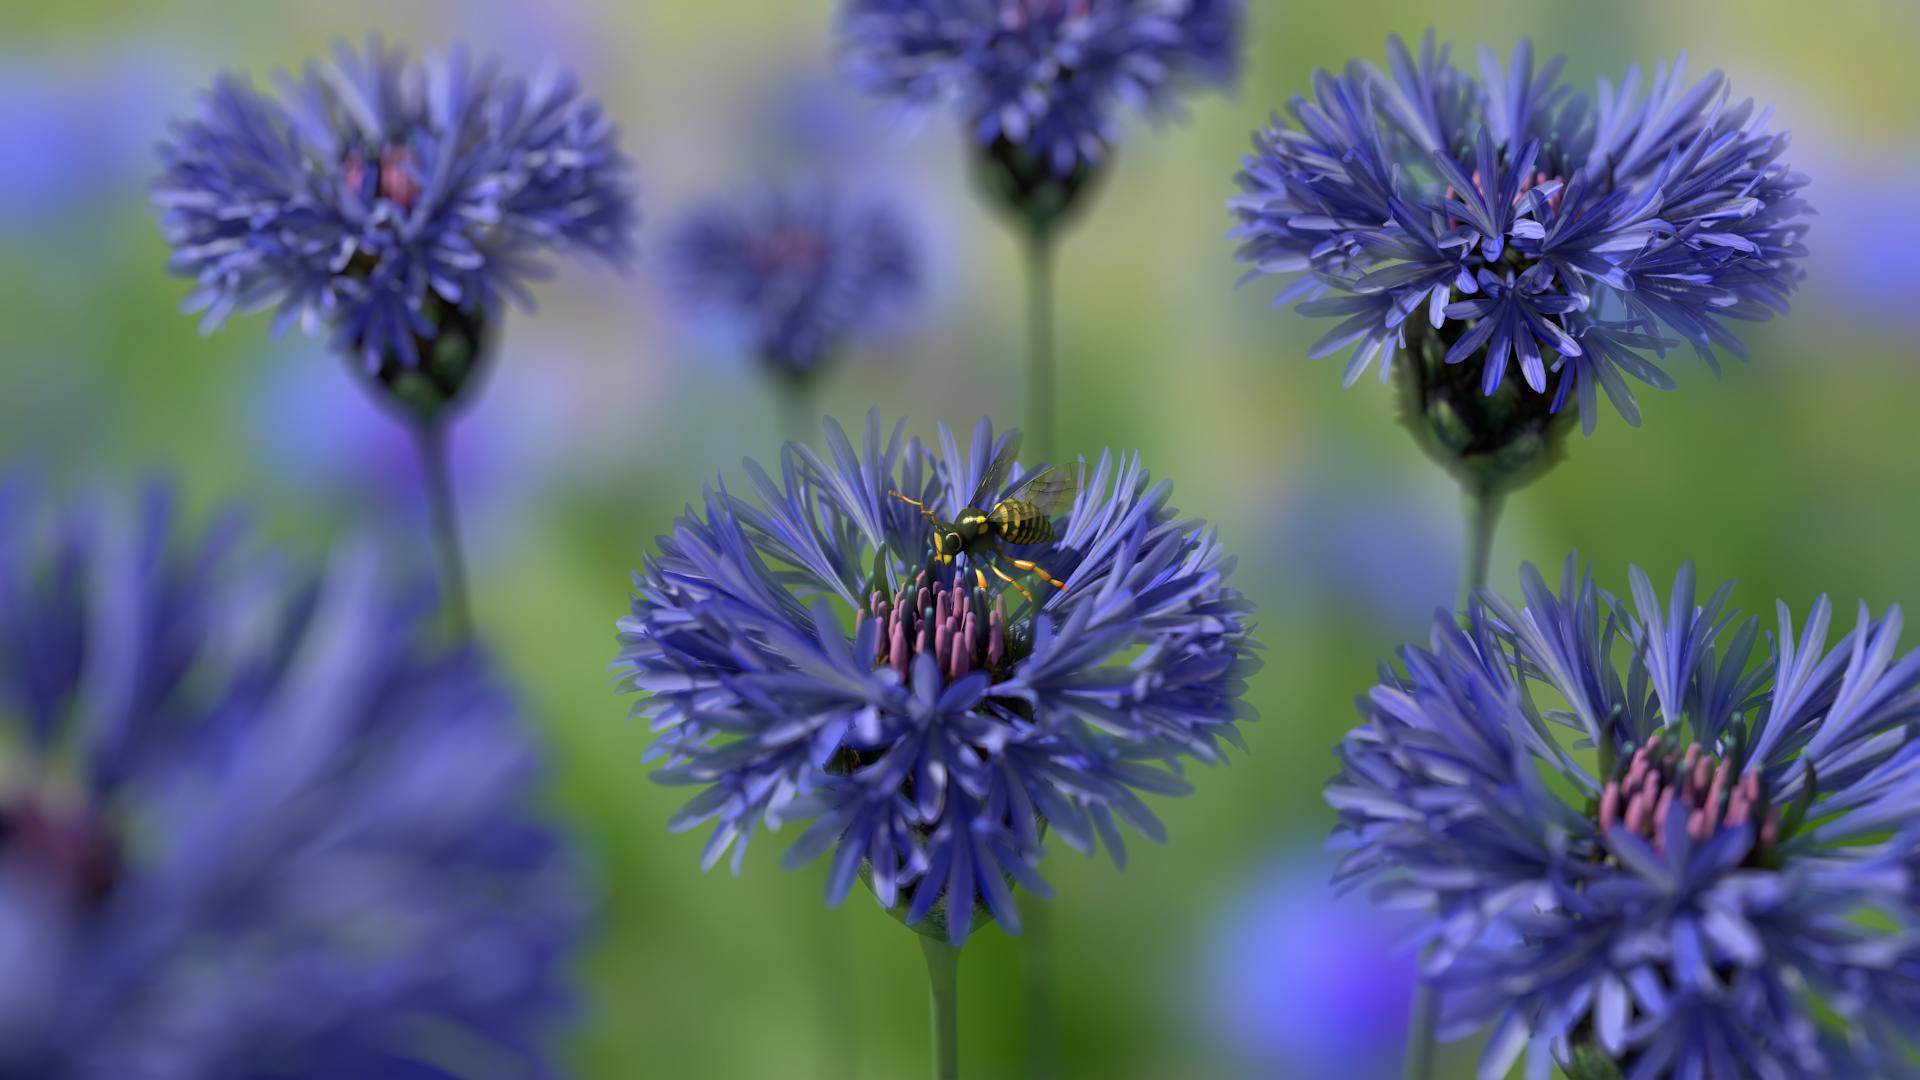 Wasp on Cornflower image Lariad In DB